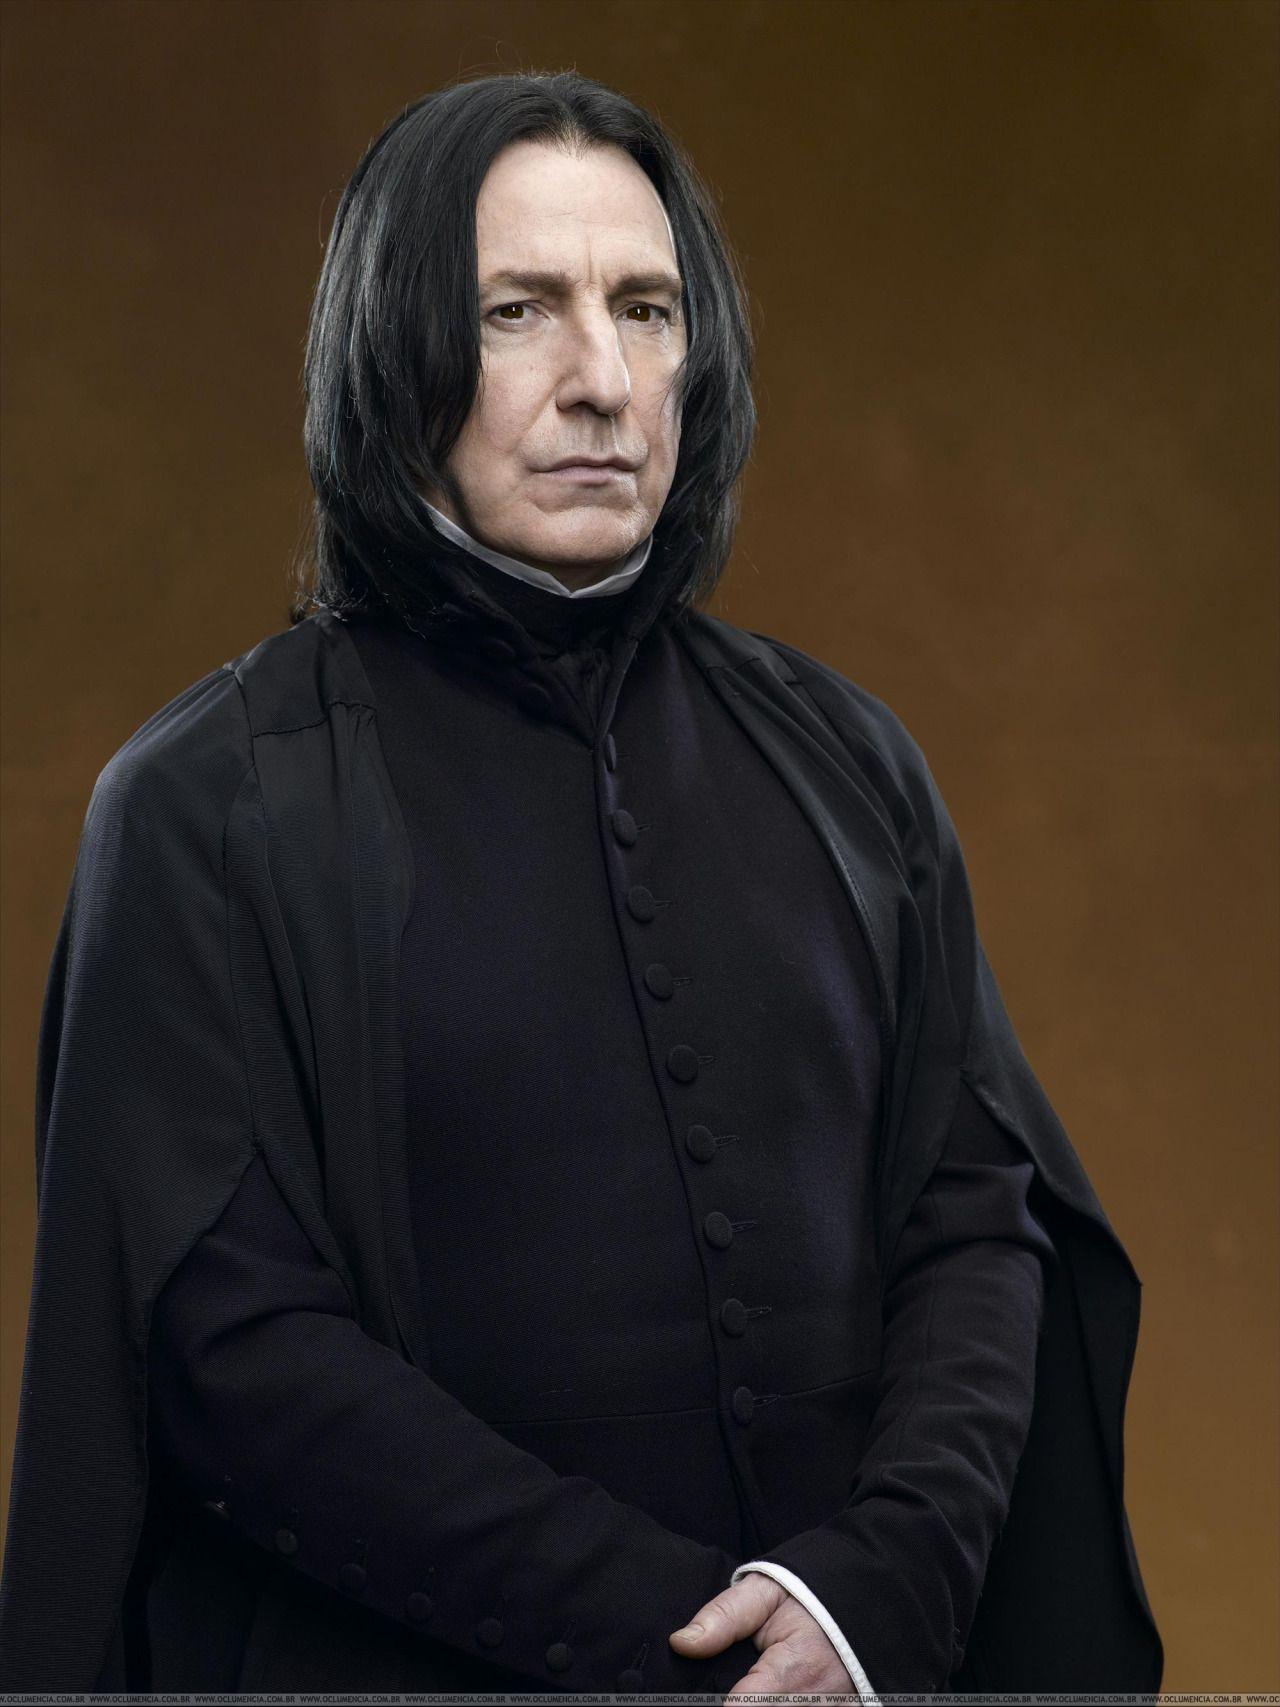 Pin Von Annie Cote Auf Severus Snape Promis Zauberer Party Zauberer